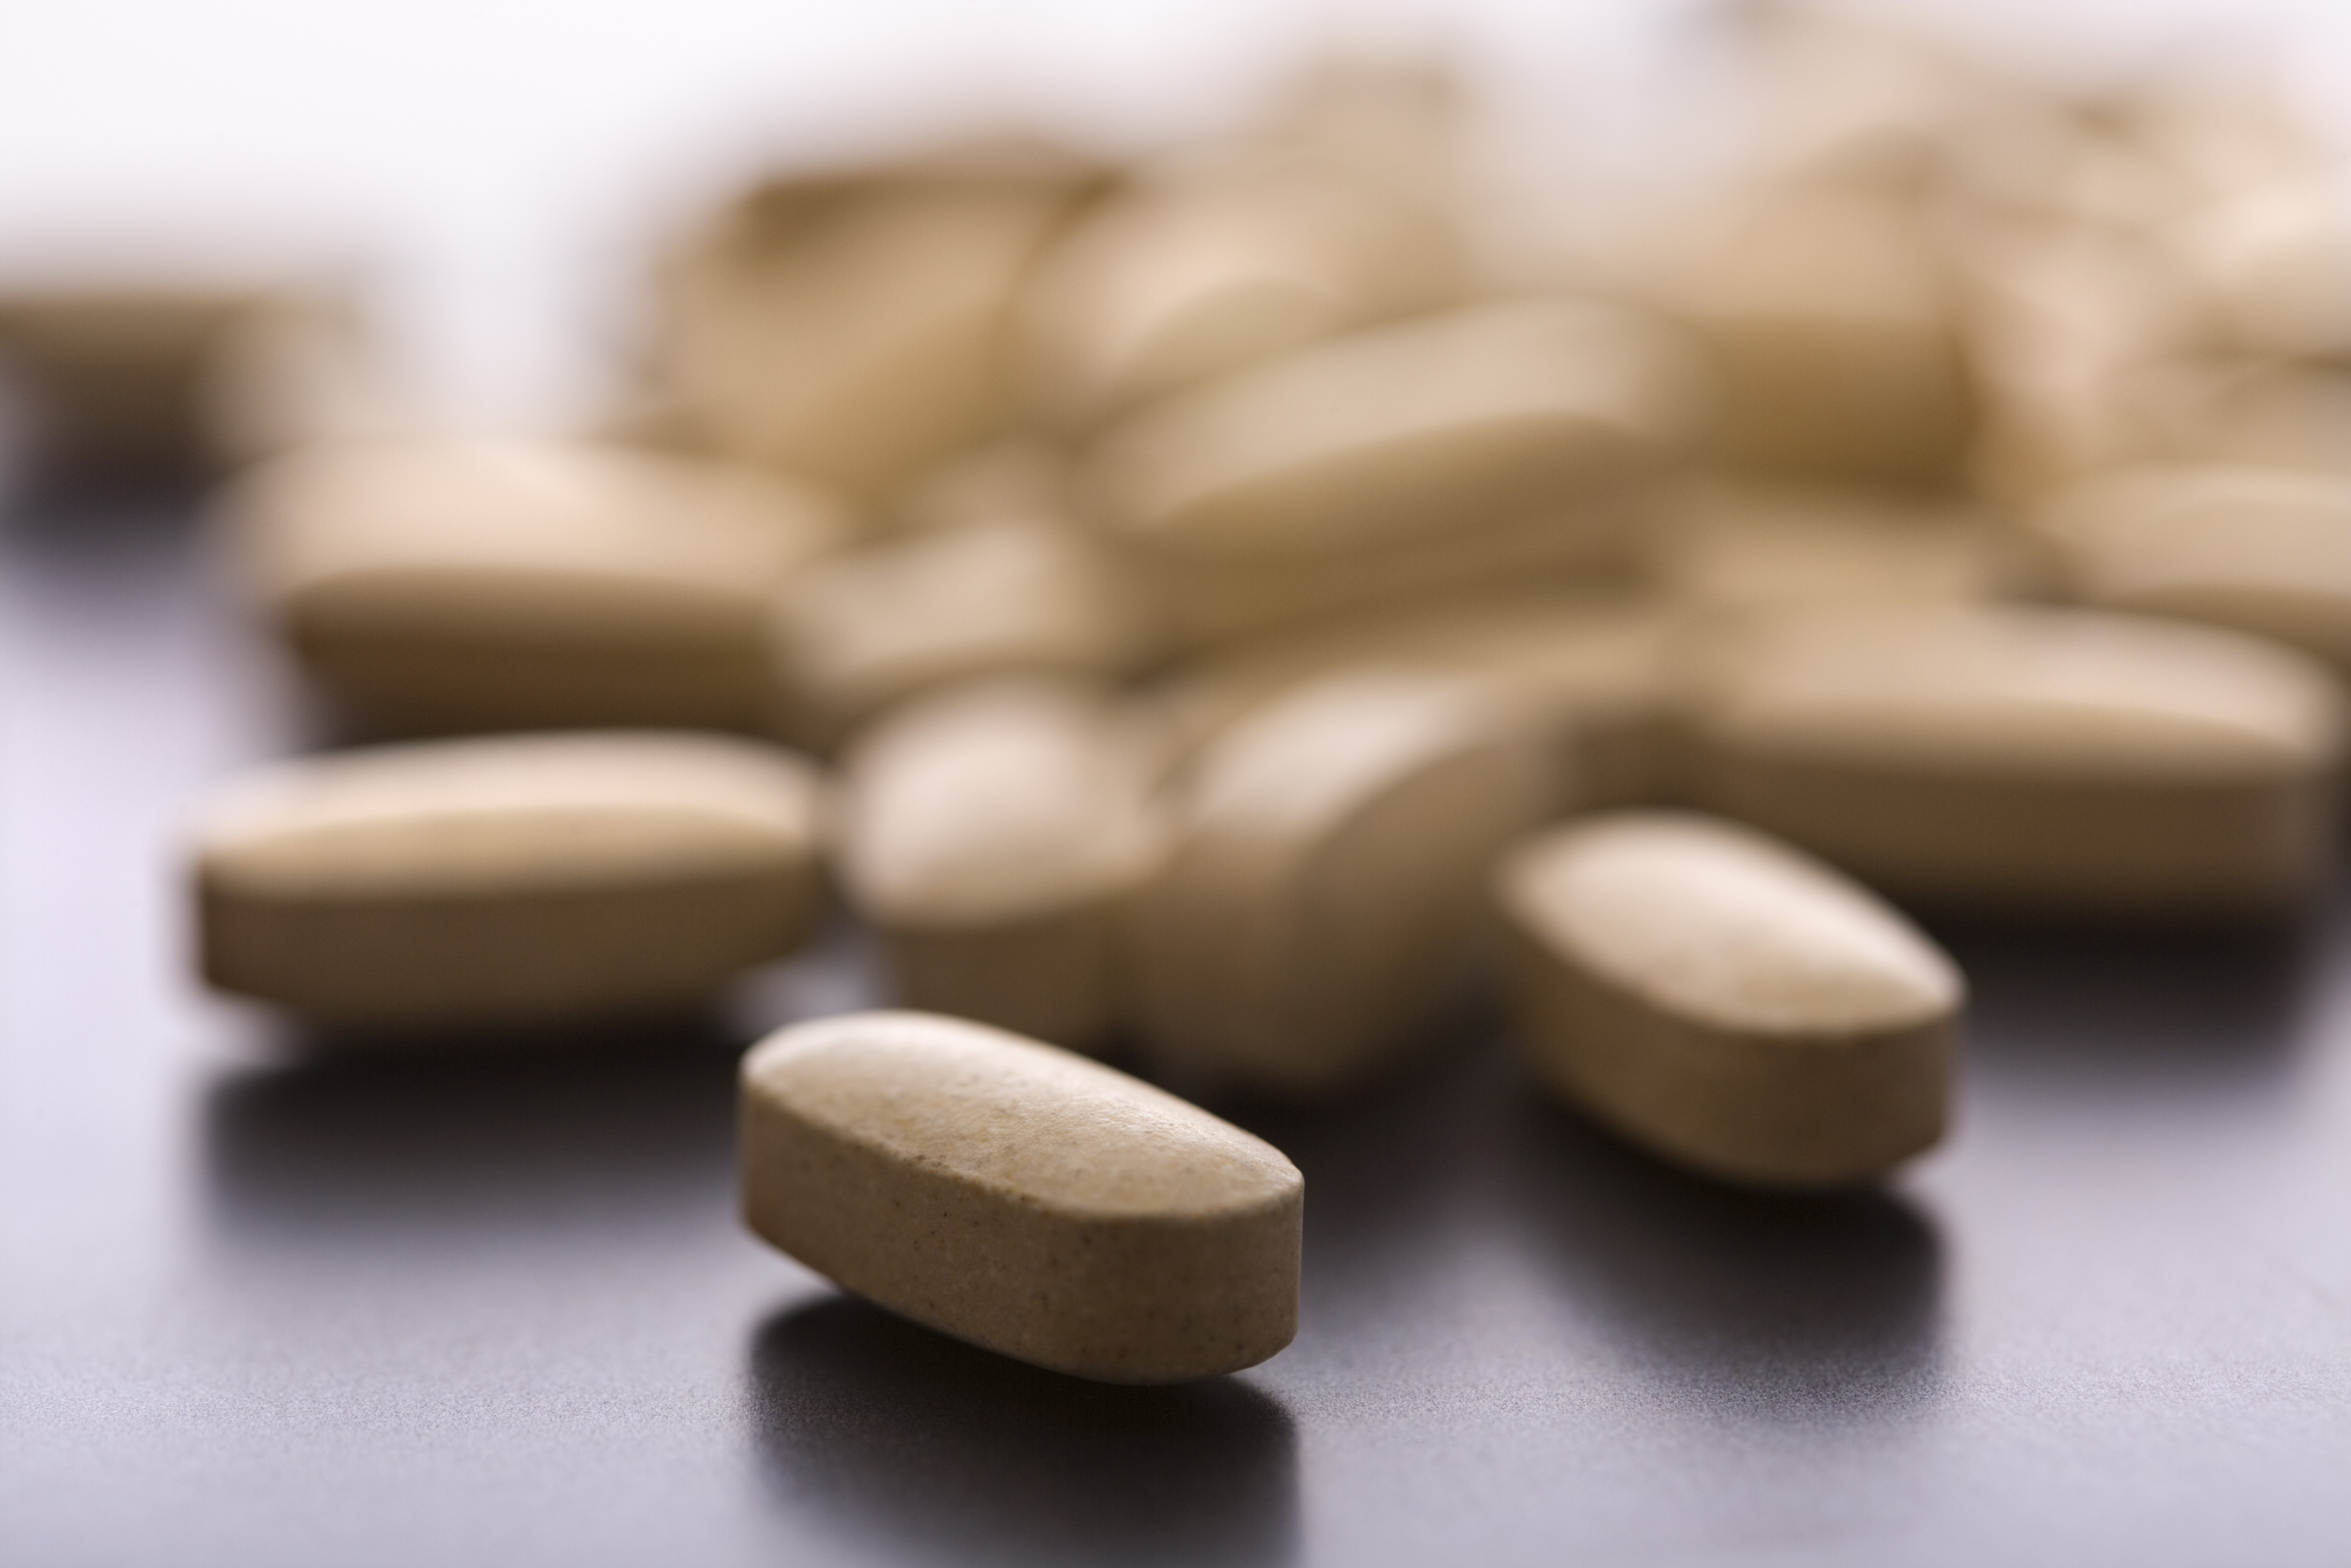 ... the british drug manufacturer glaxosmithkline gsk has agreed to plead